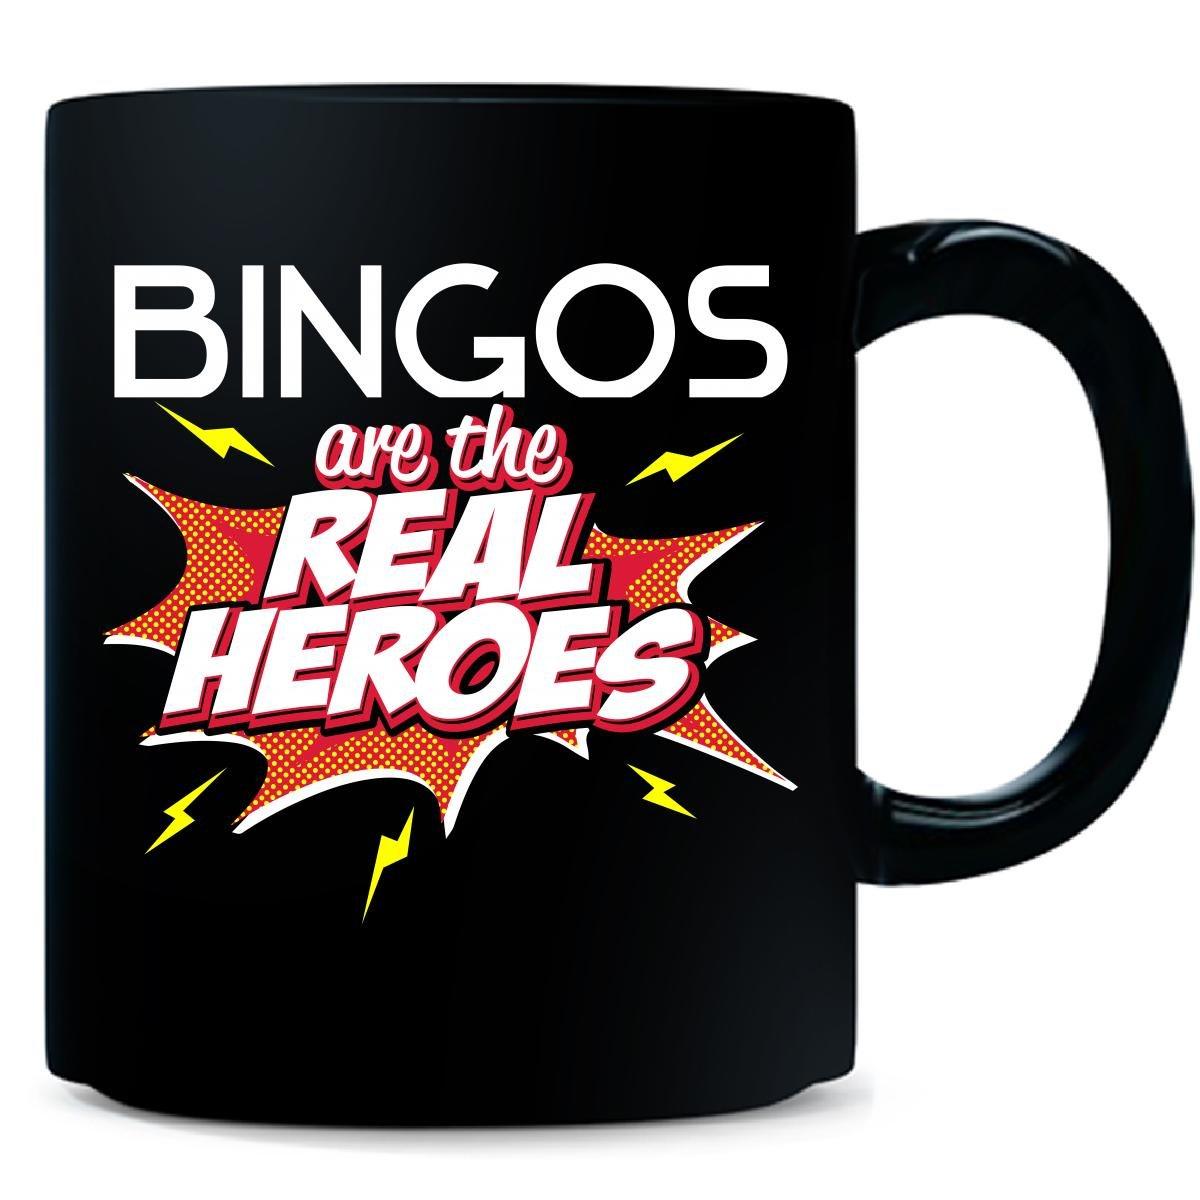 Bingos Are The Real Heroes Cute Gift For Grandmother - Mug